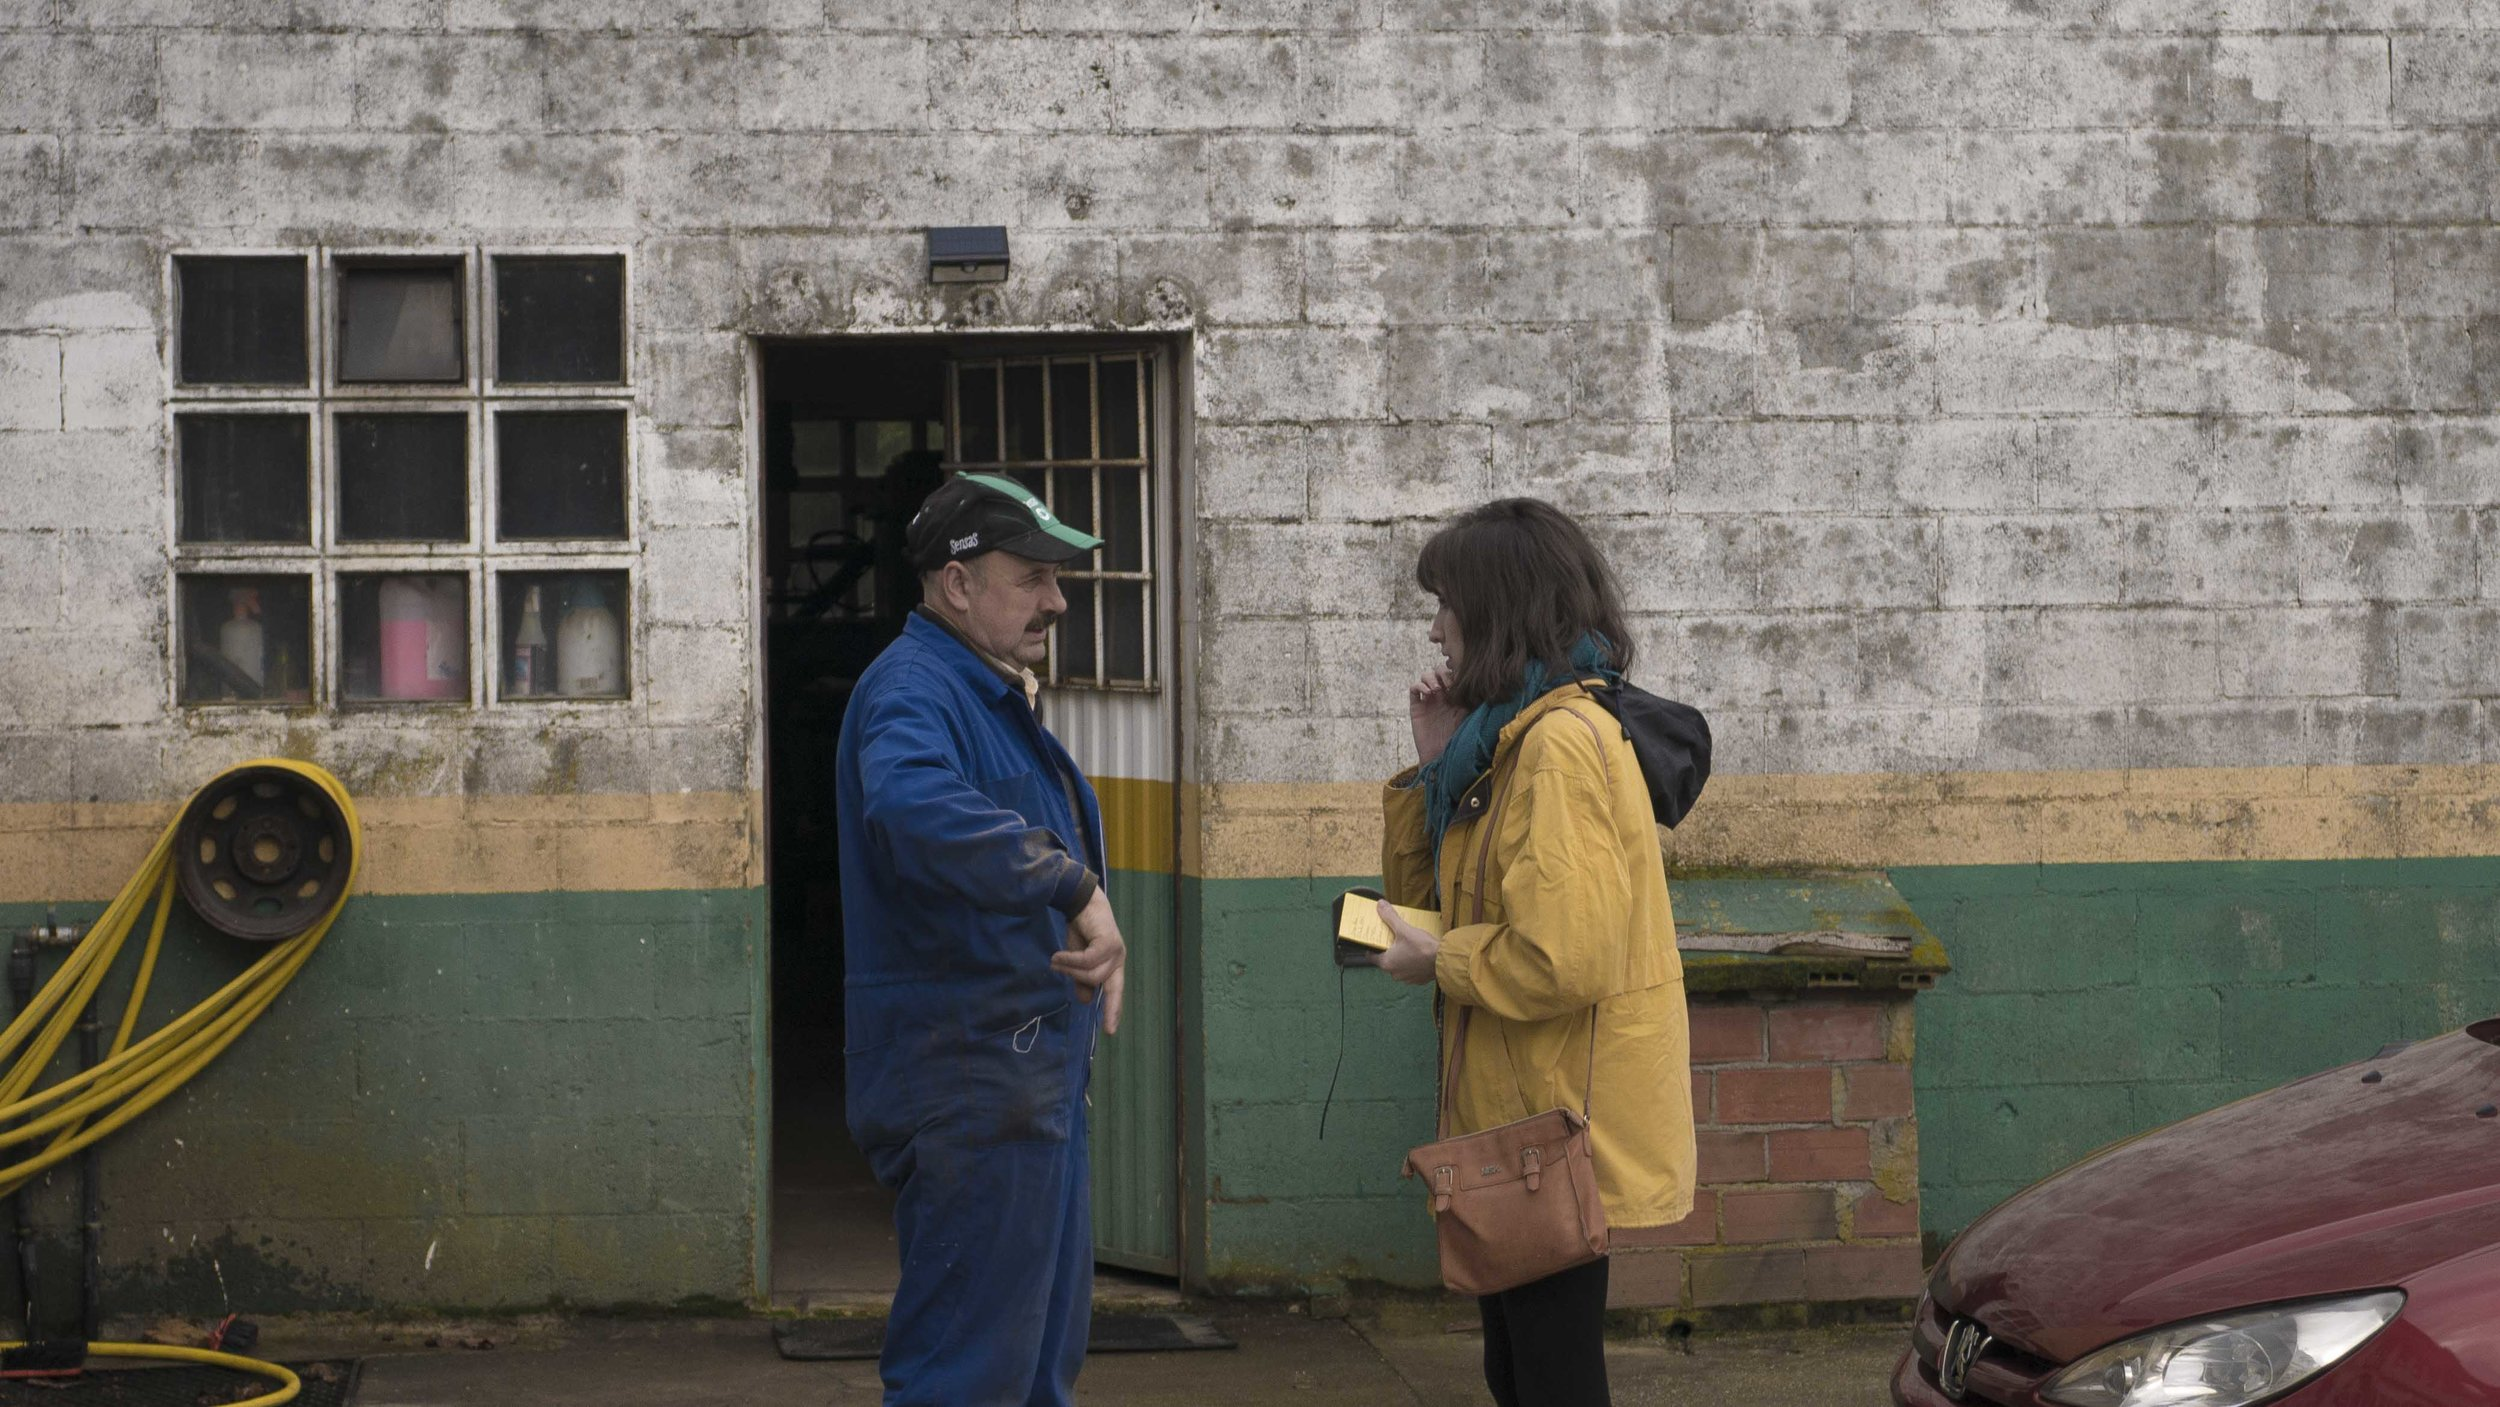 Noelia María Muíño González talking to a crew member on holding area in Spain